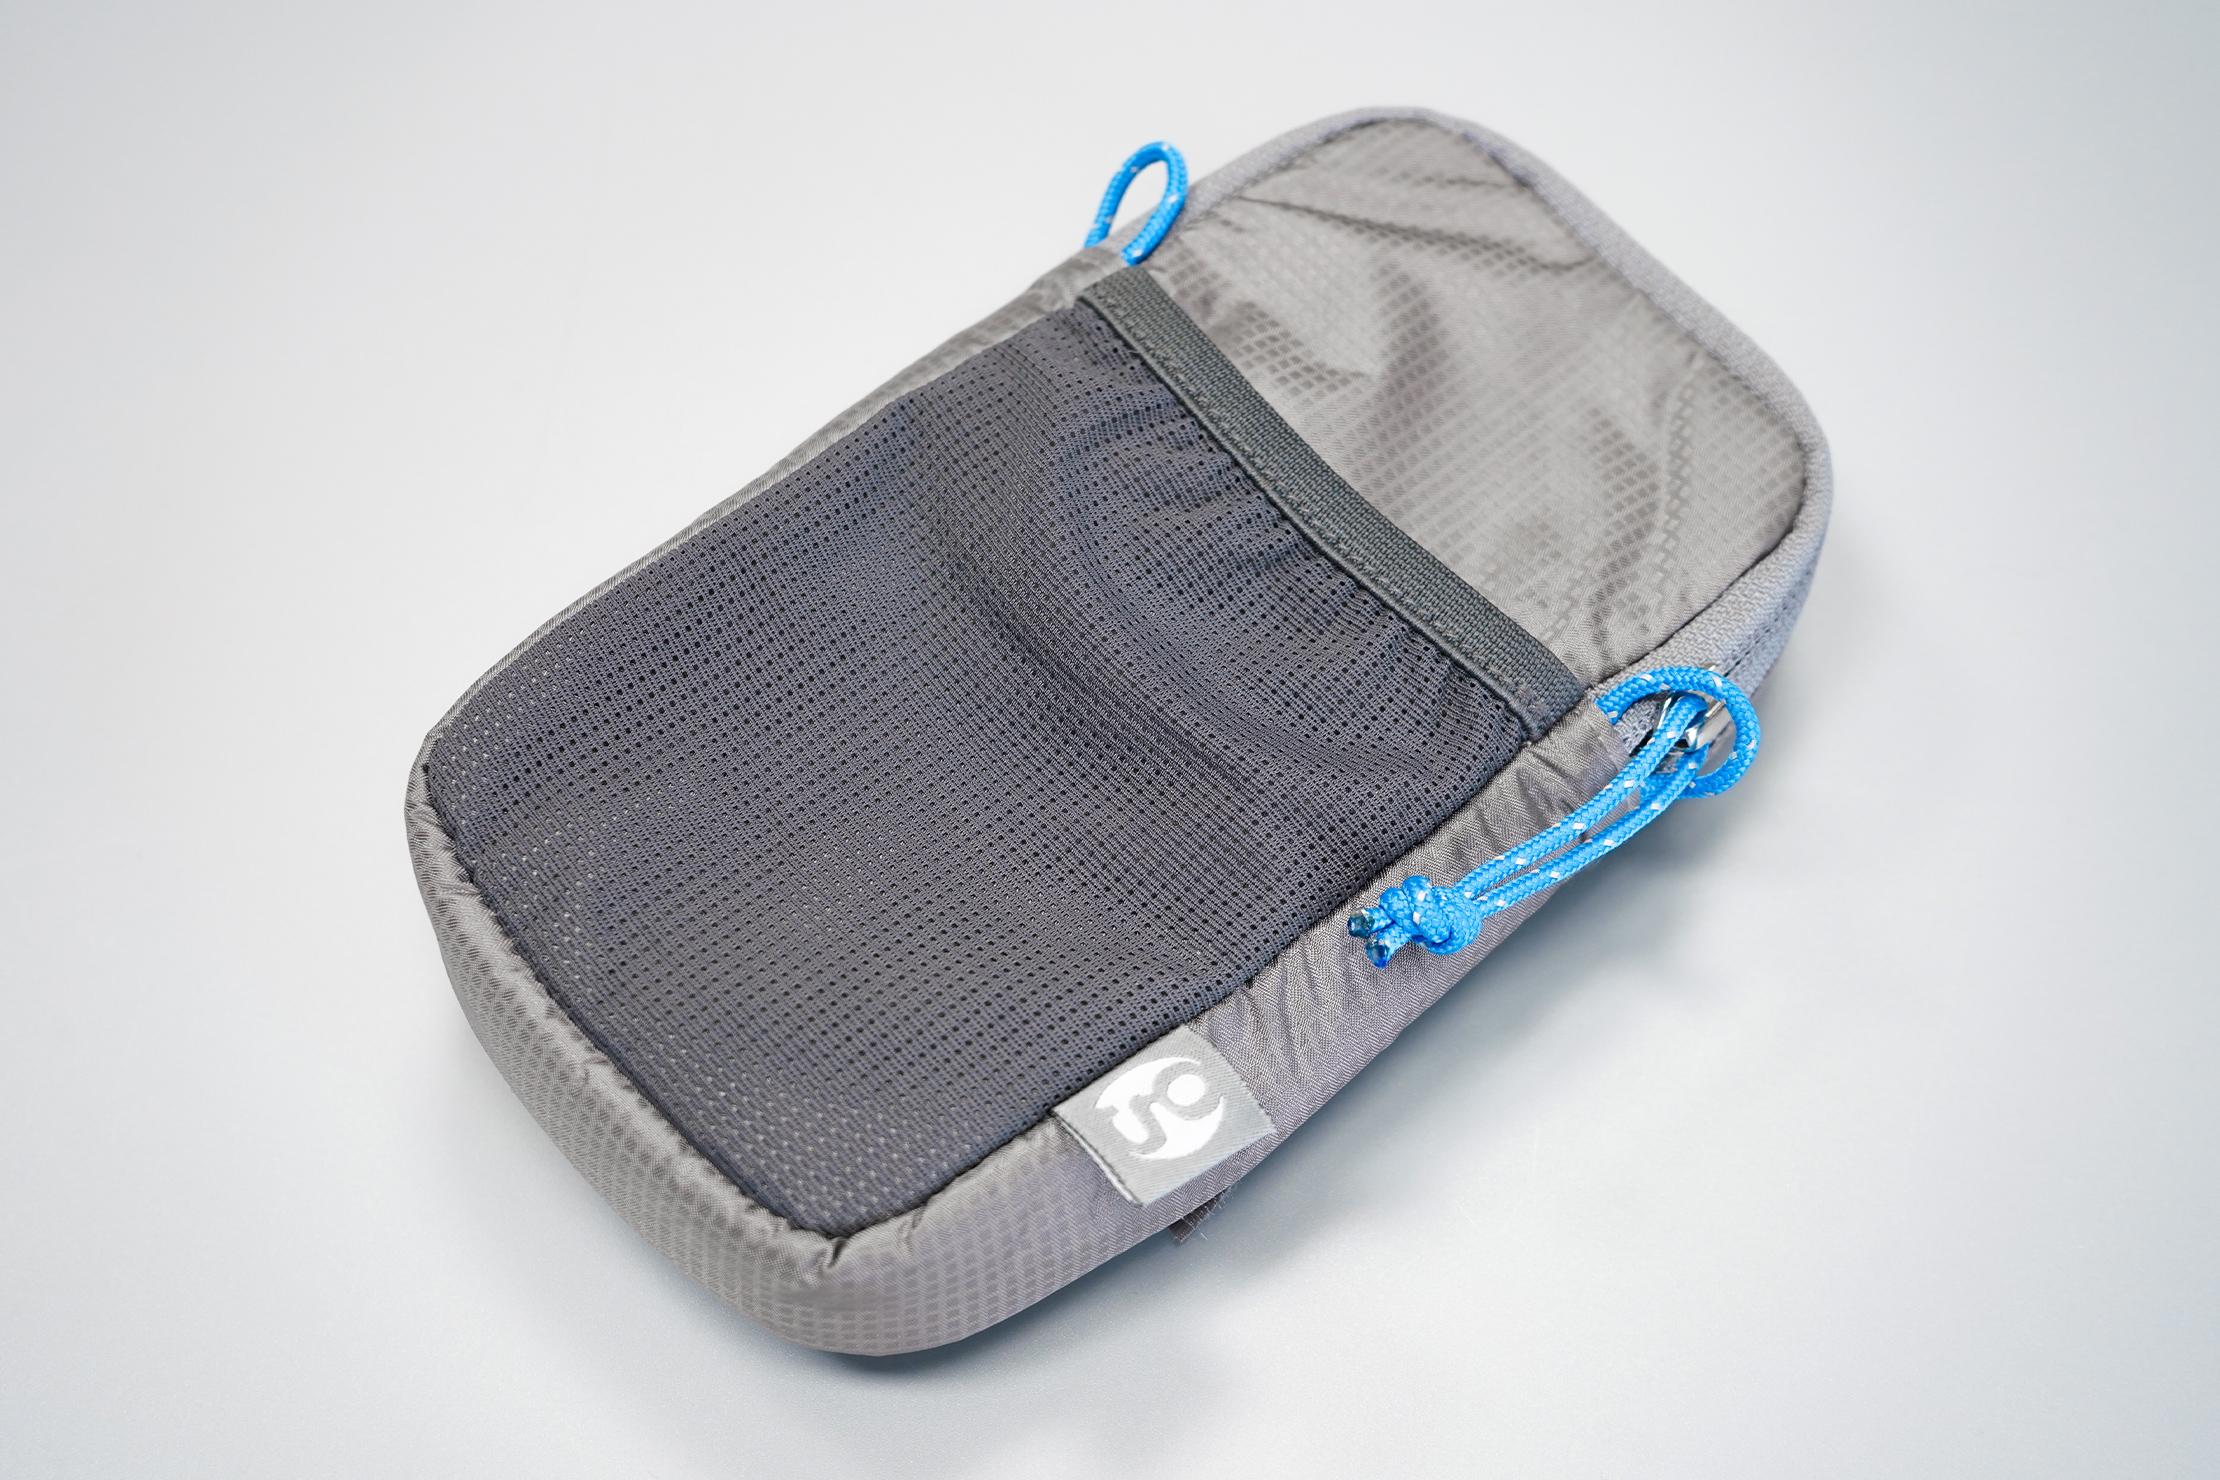 Gossamer Gear Shoulder Strap Pocket | Materials, branding, and zipper